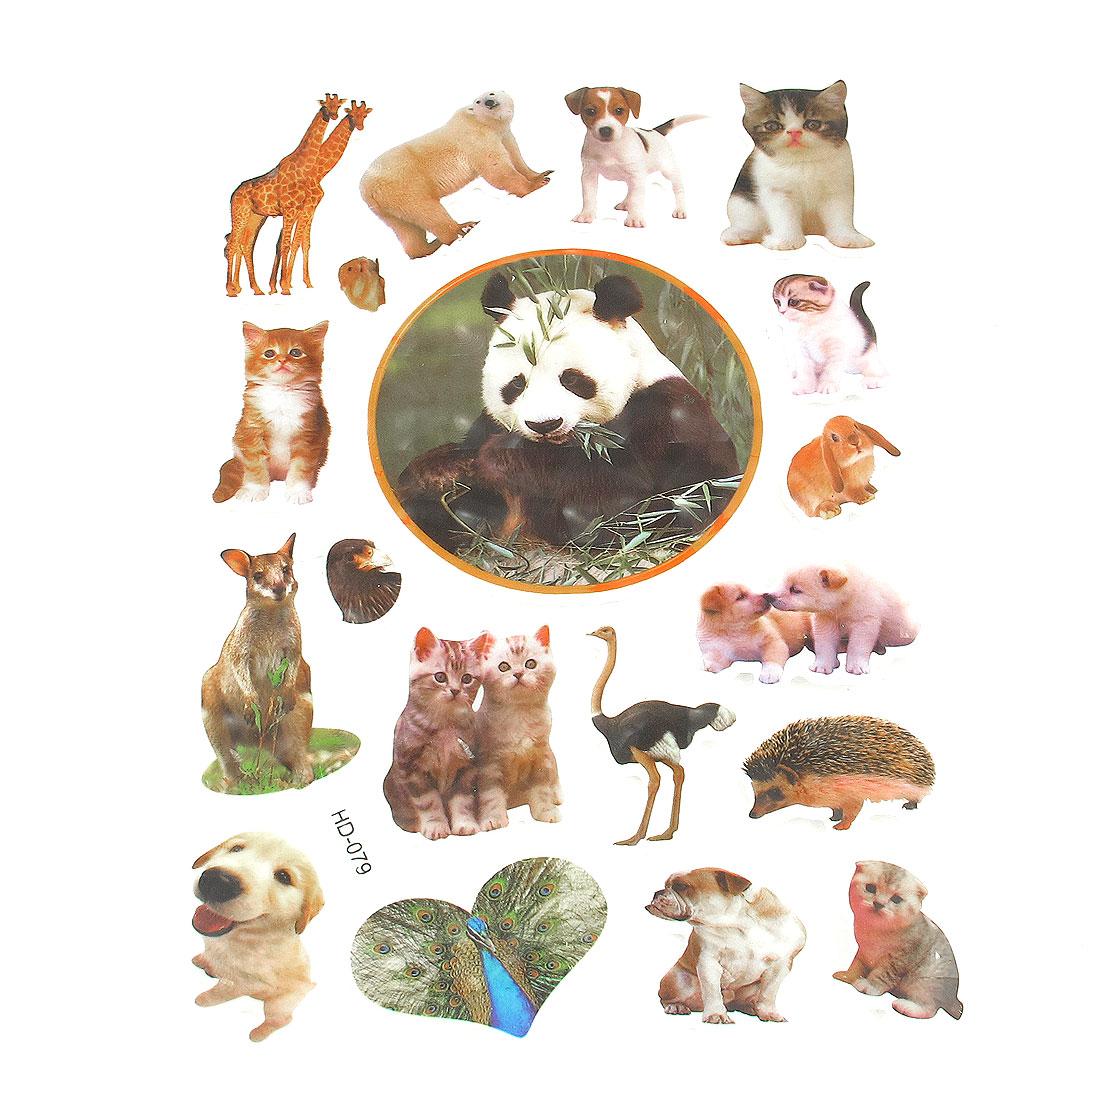 Multicolored Dogs Cats Giraffe Craft Scrapbook Stickers